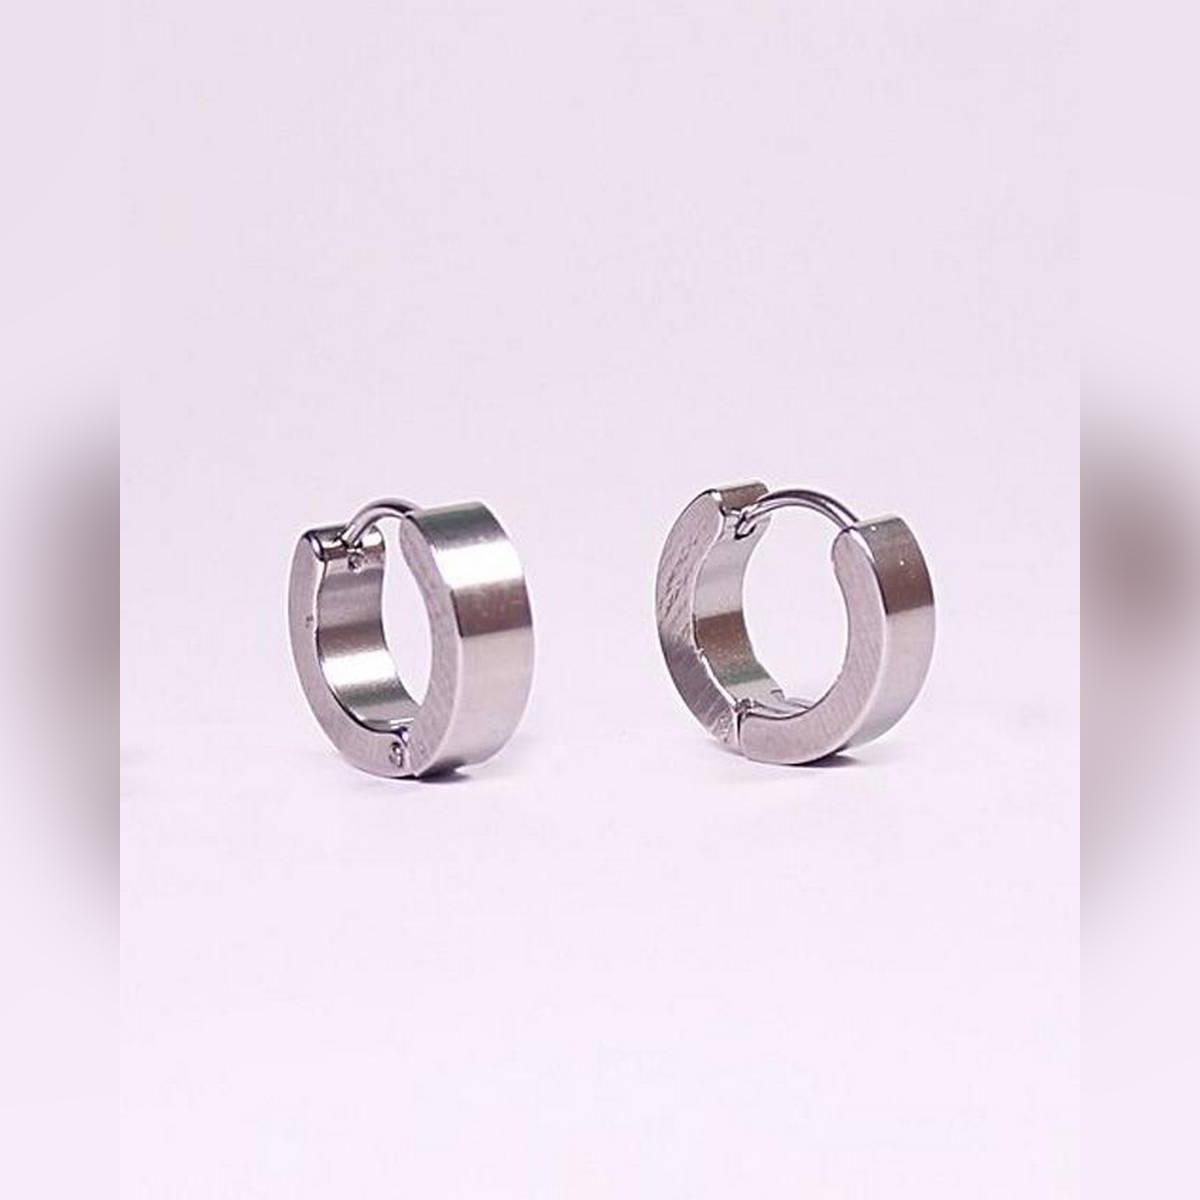 Silver Stainless Steel Earring Unisex